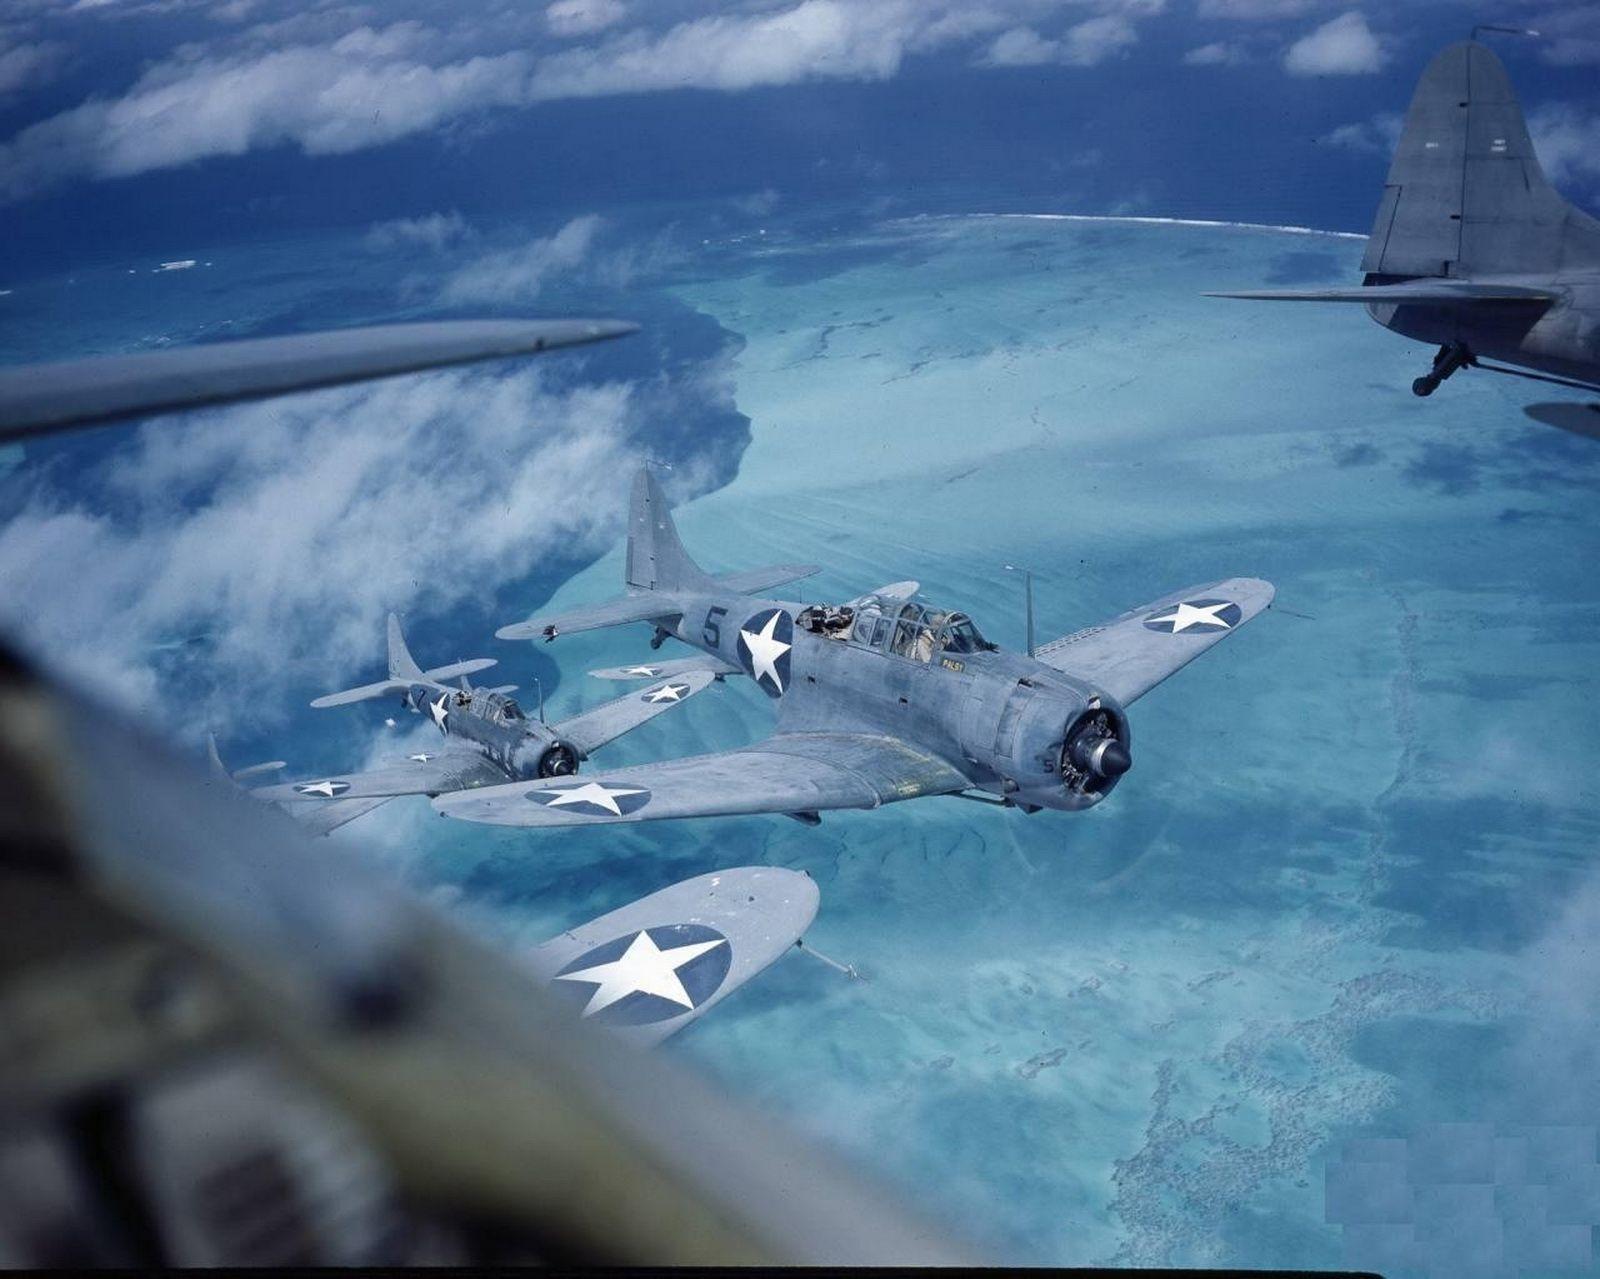 Pin On Ww2 Naval Aviation